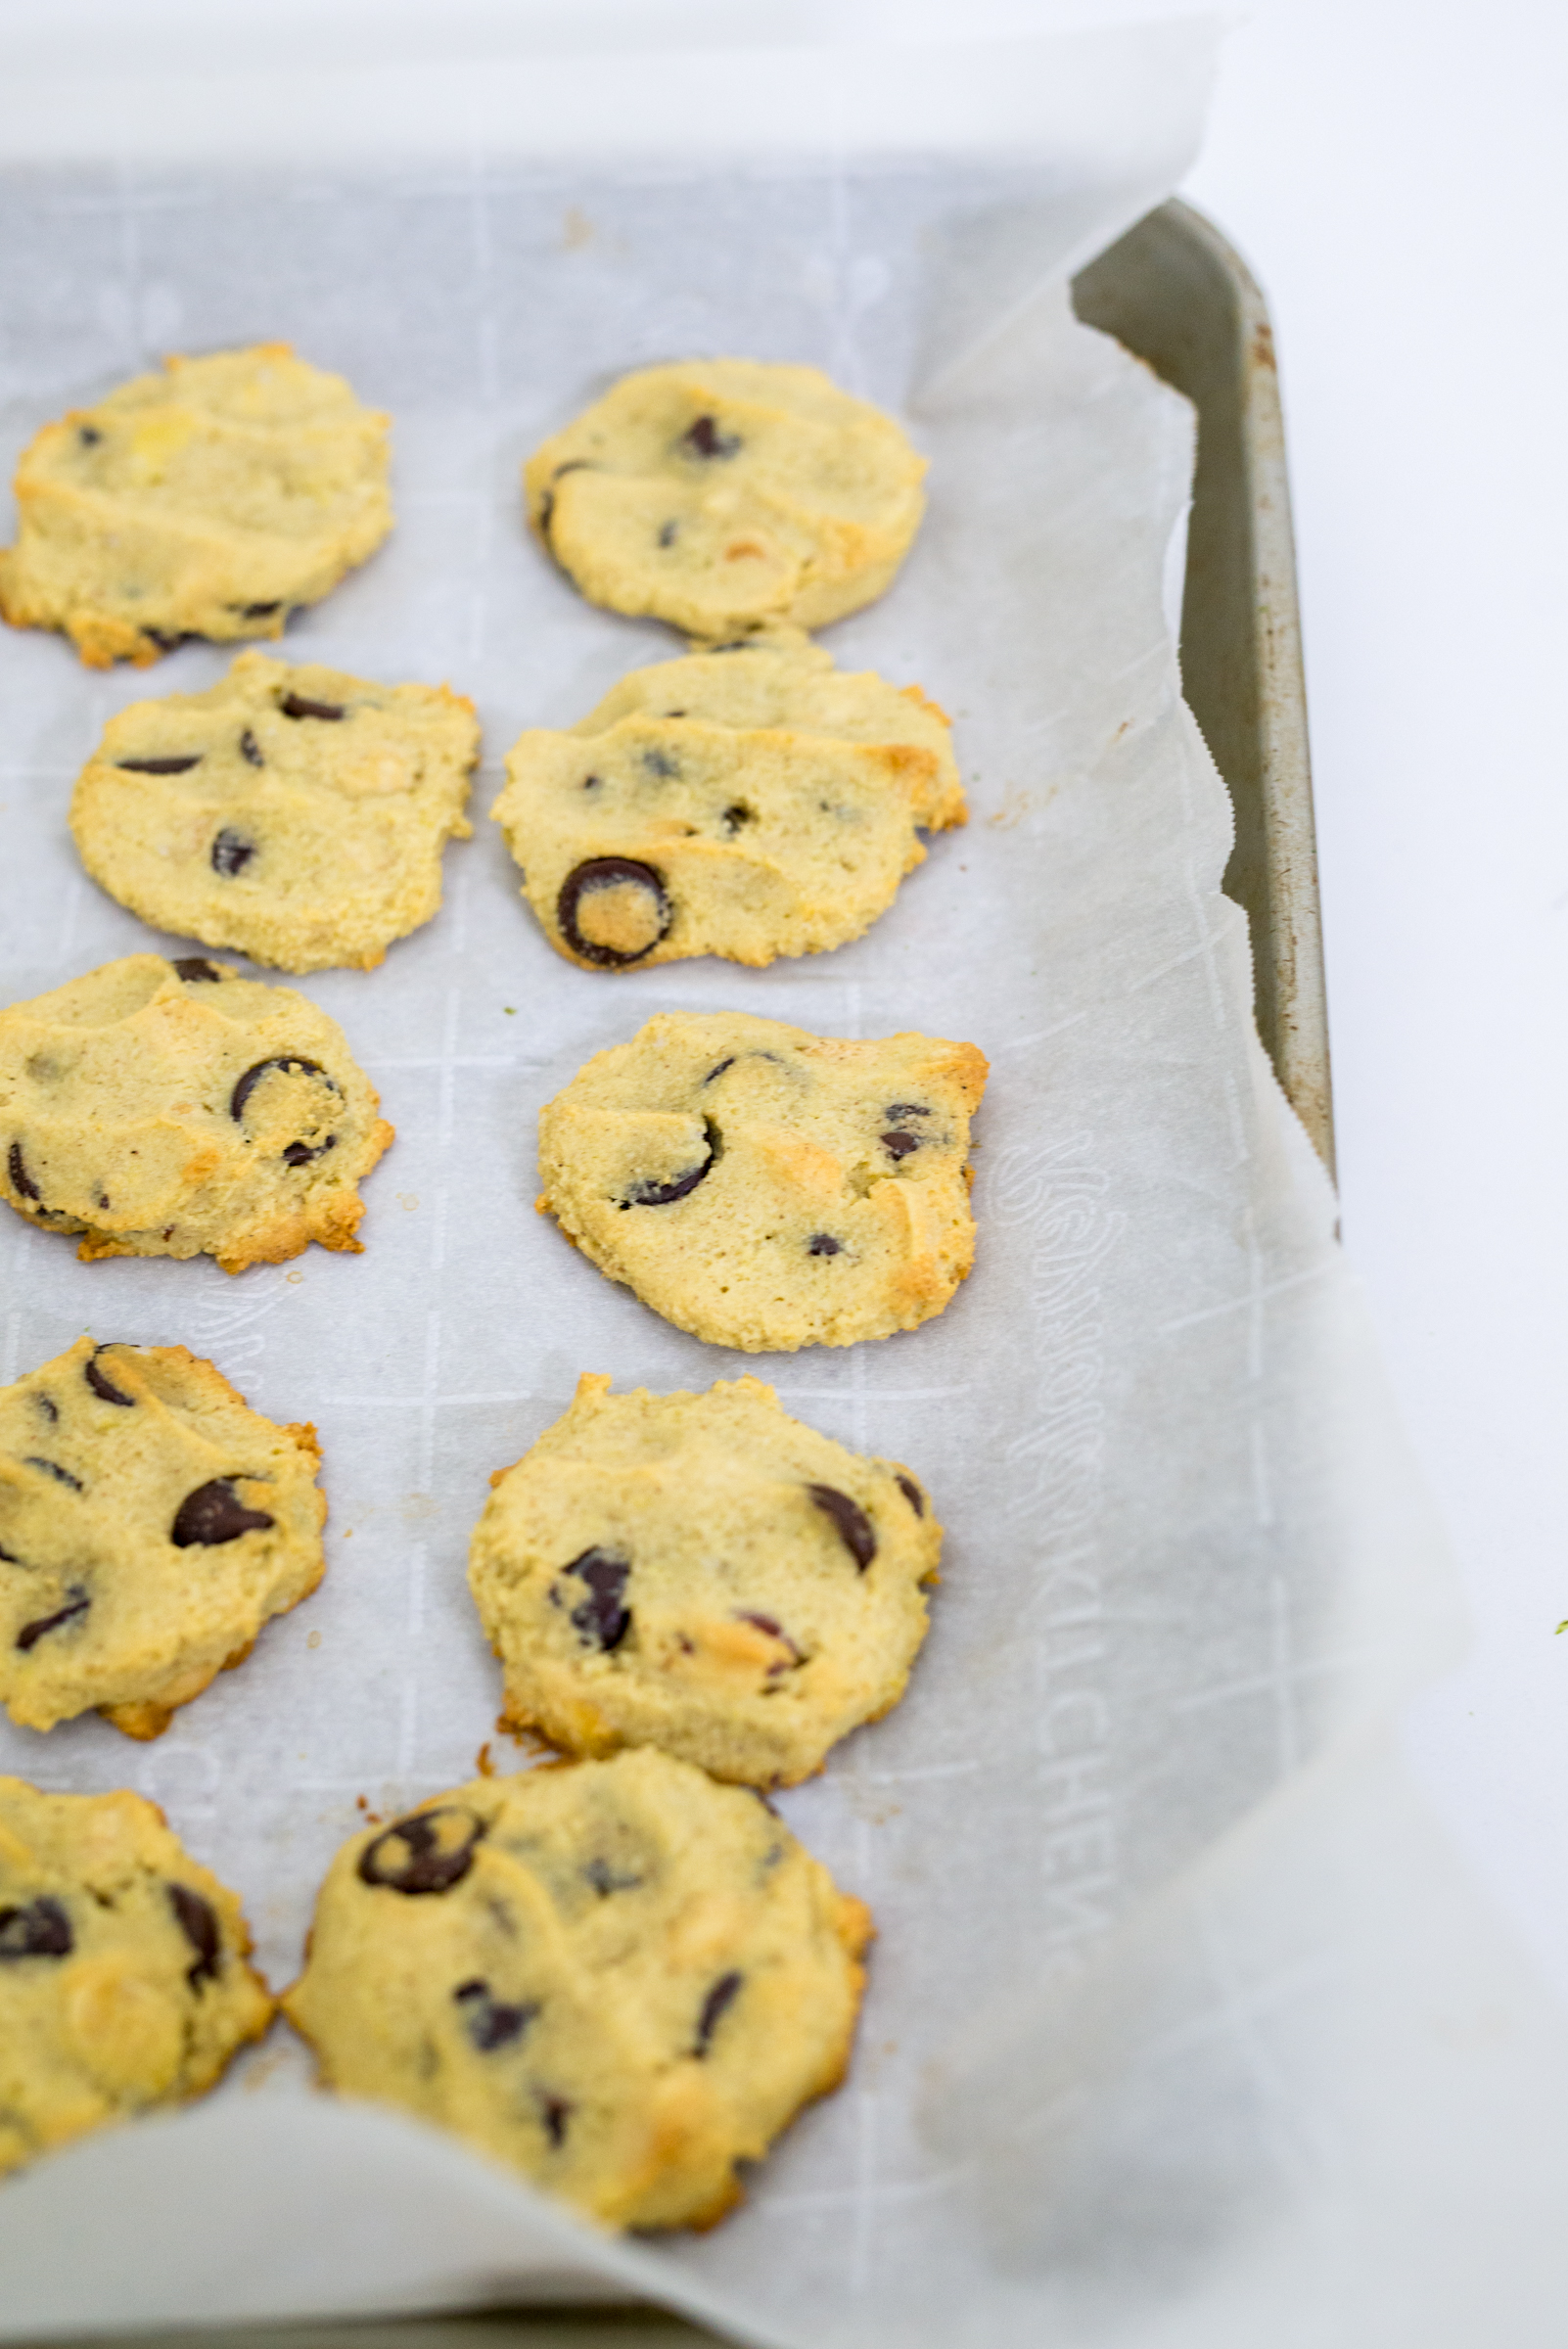 Chocolate Chip Cookies | Gluten Free + Paleo Friendly Option | Foodthengames.com